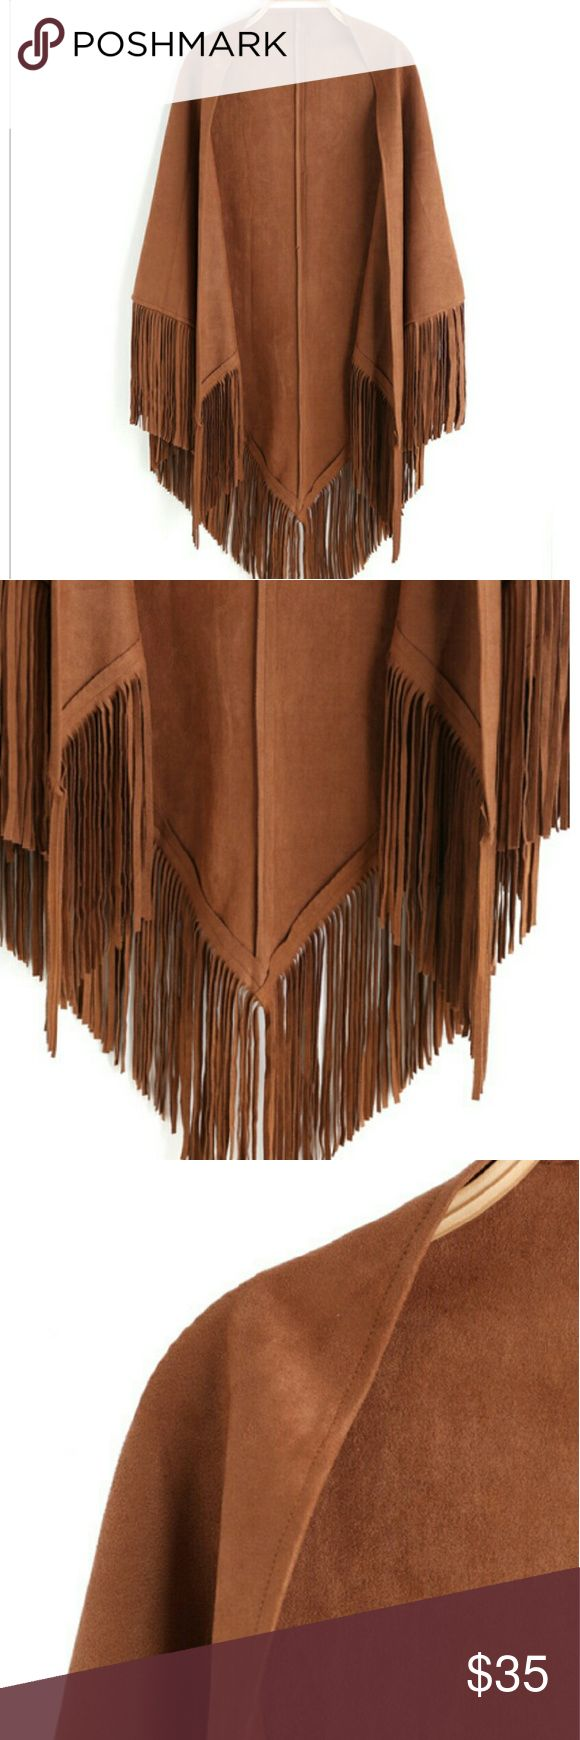 Suede tassle scarf -suede tassle scarf -never been worn *firm price* Accessories Scarves & Wraps